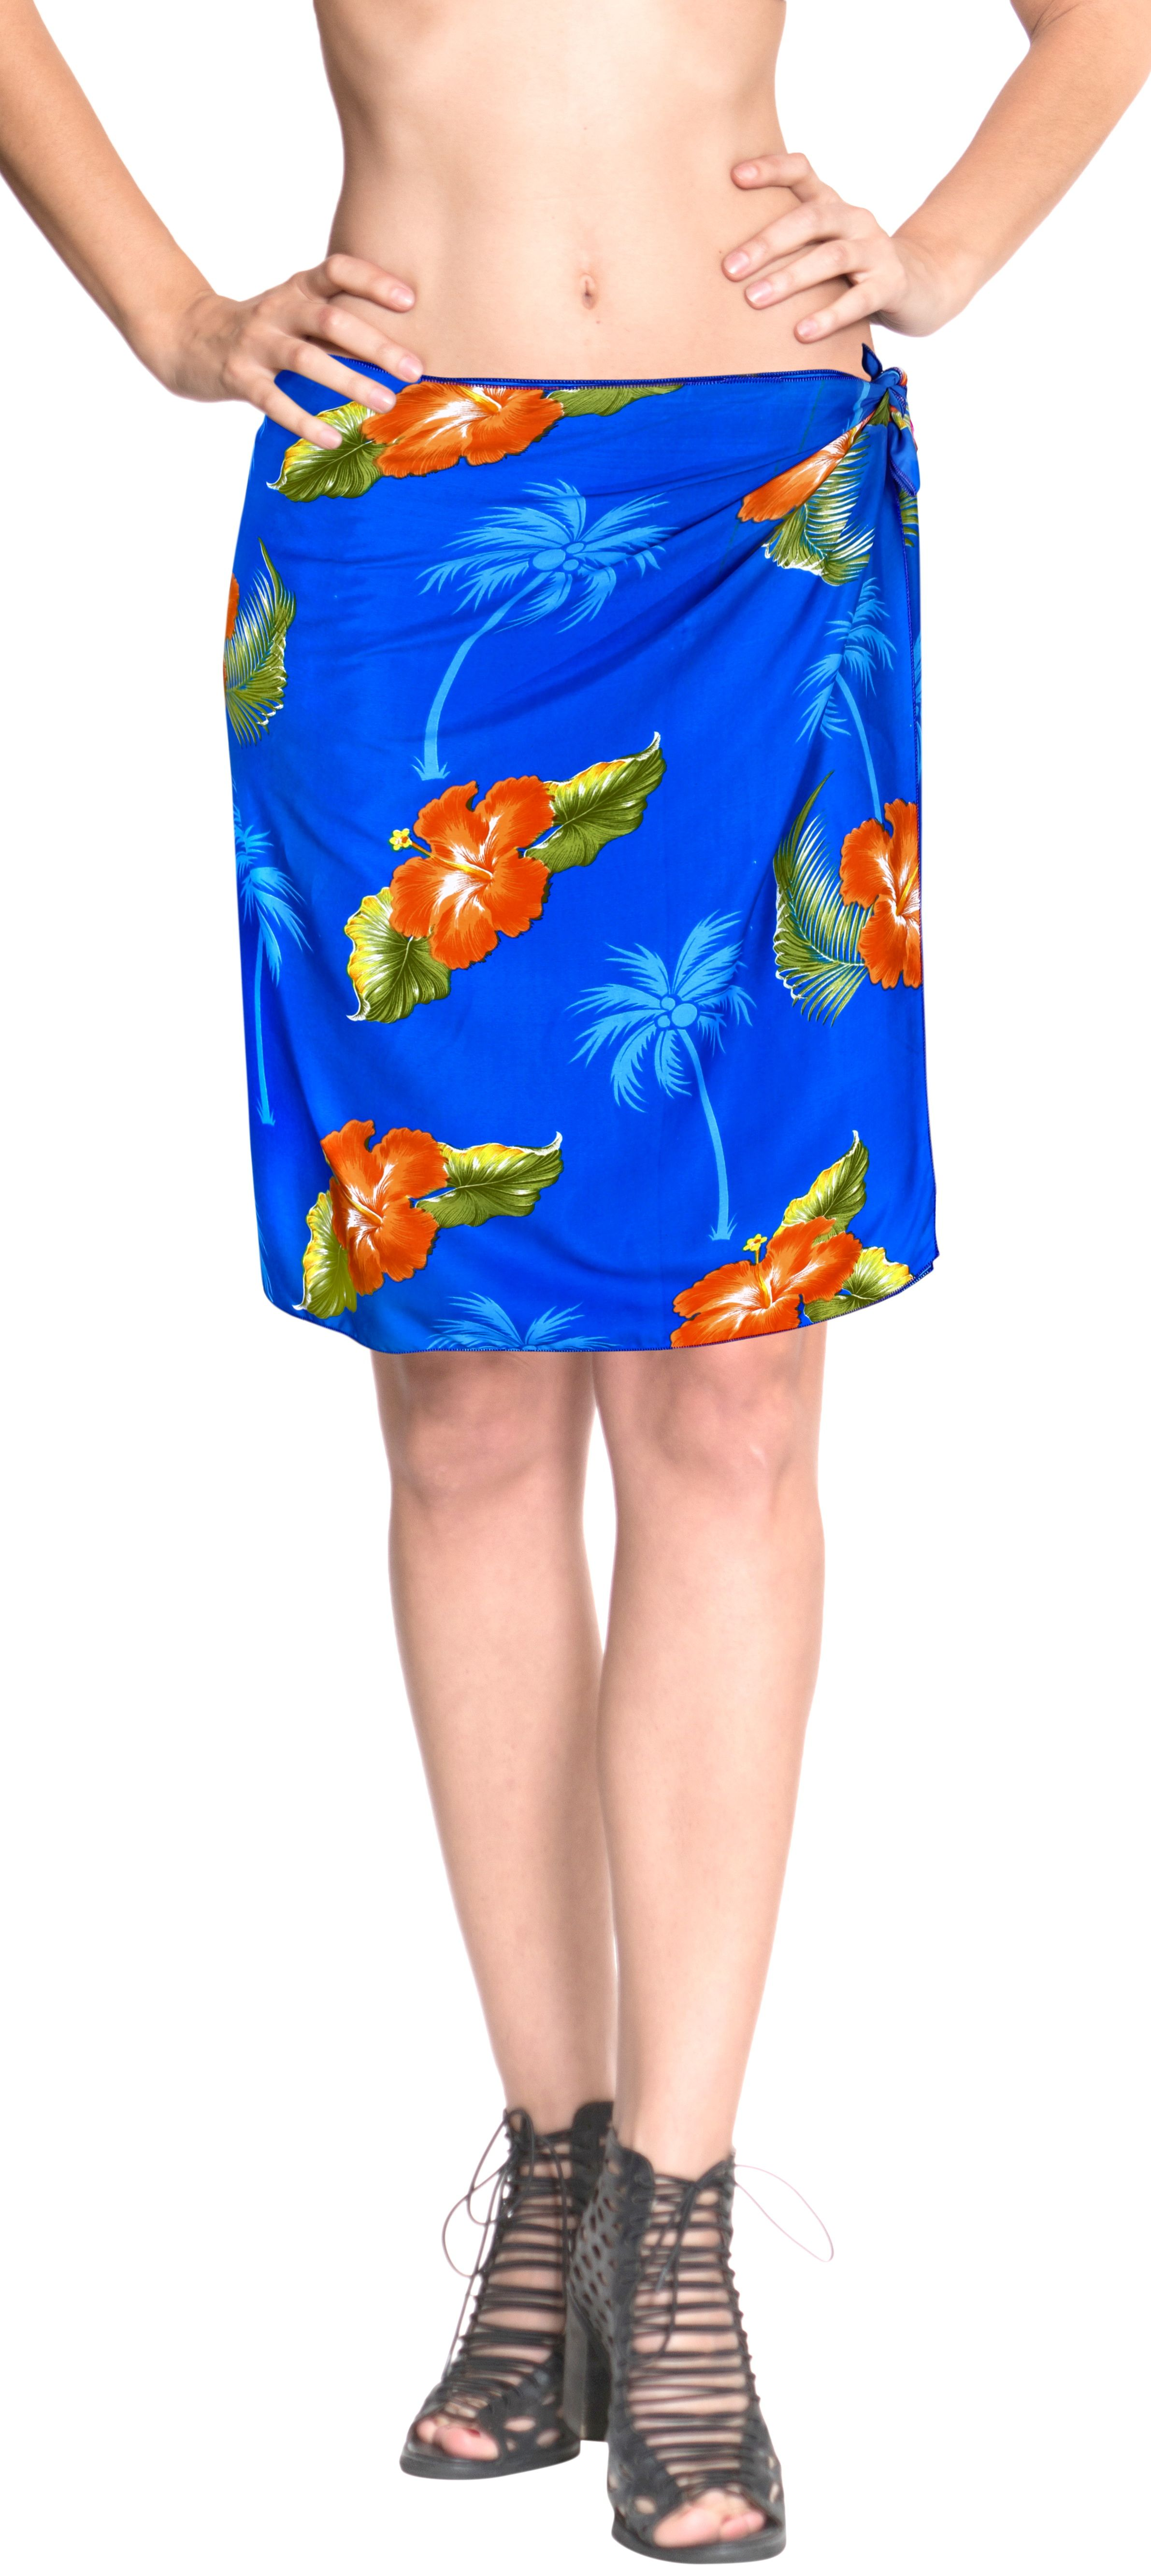 a37489f847 LA LEELA Women's Beachwear Bathing Mini Sarong Bikini Cover up Wrap Dress 8# Beachwear, #Bathing, #Women